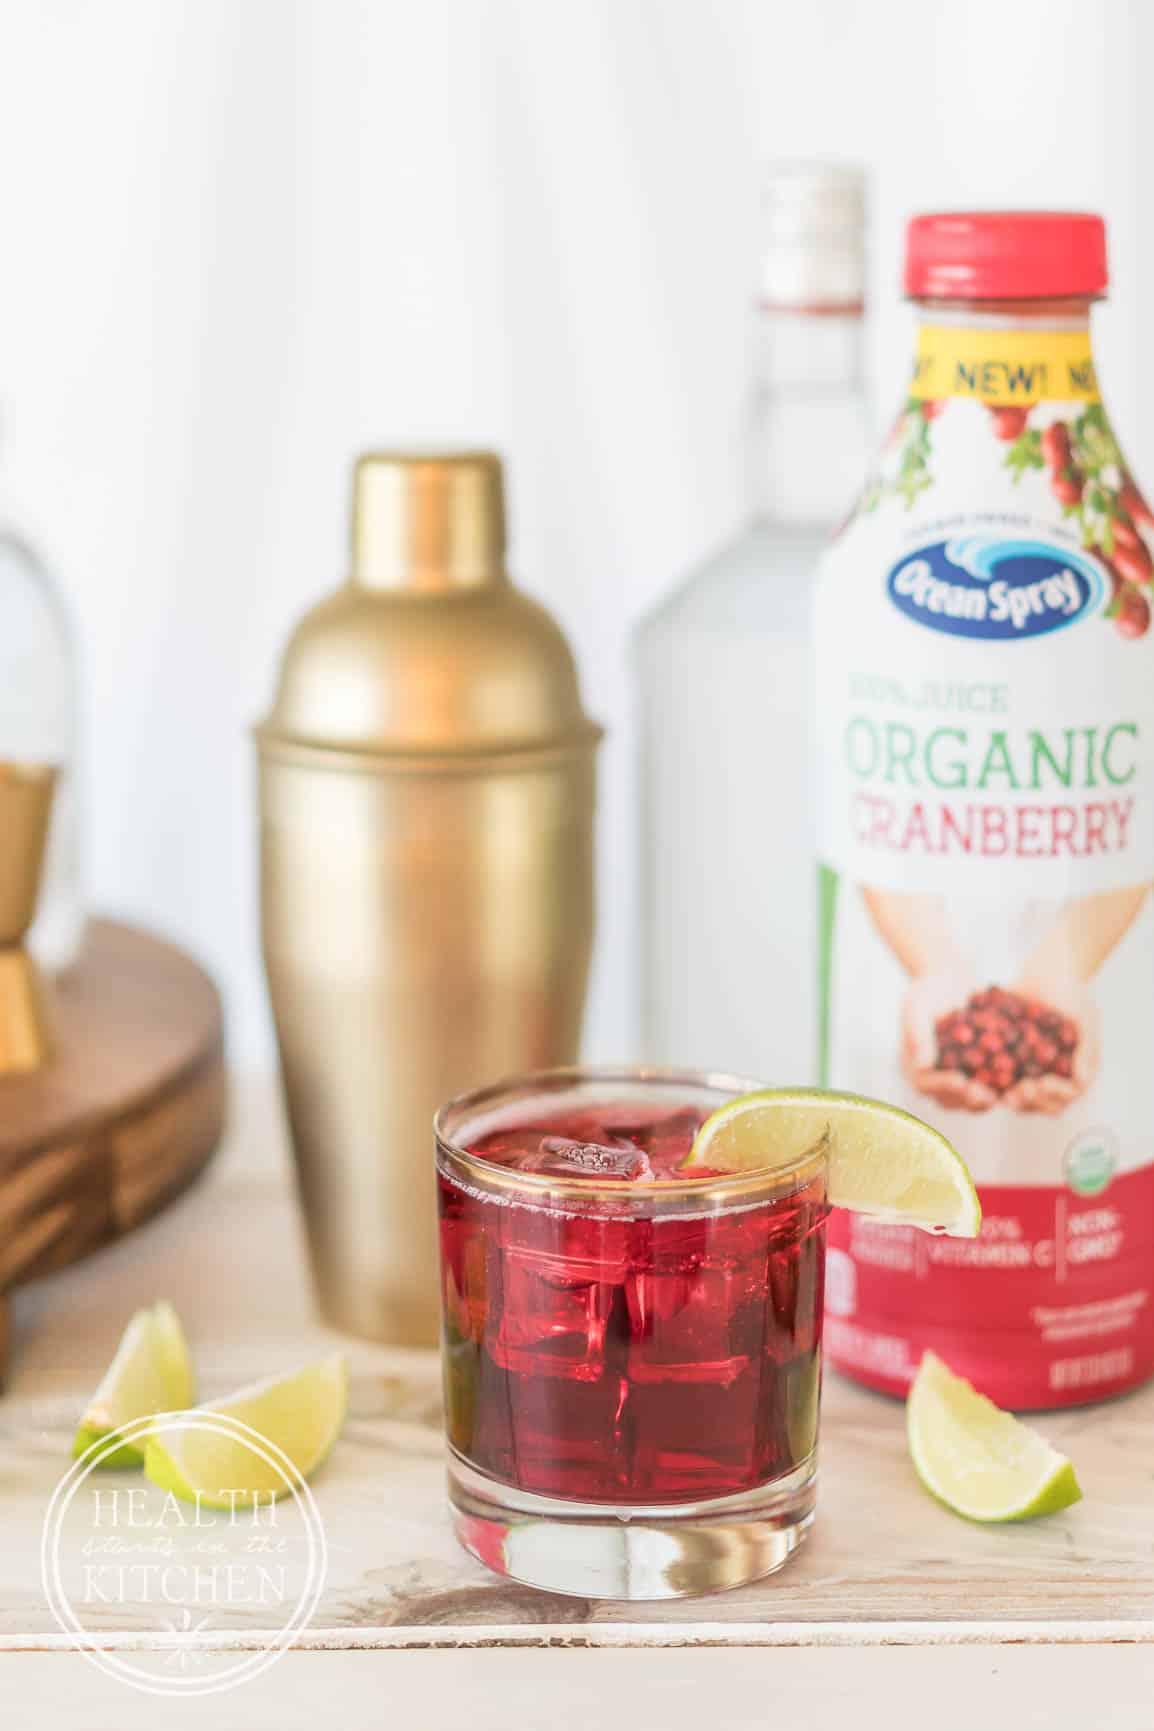 Healthier Happy Hour Sparkling Cranberry Cocktail